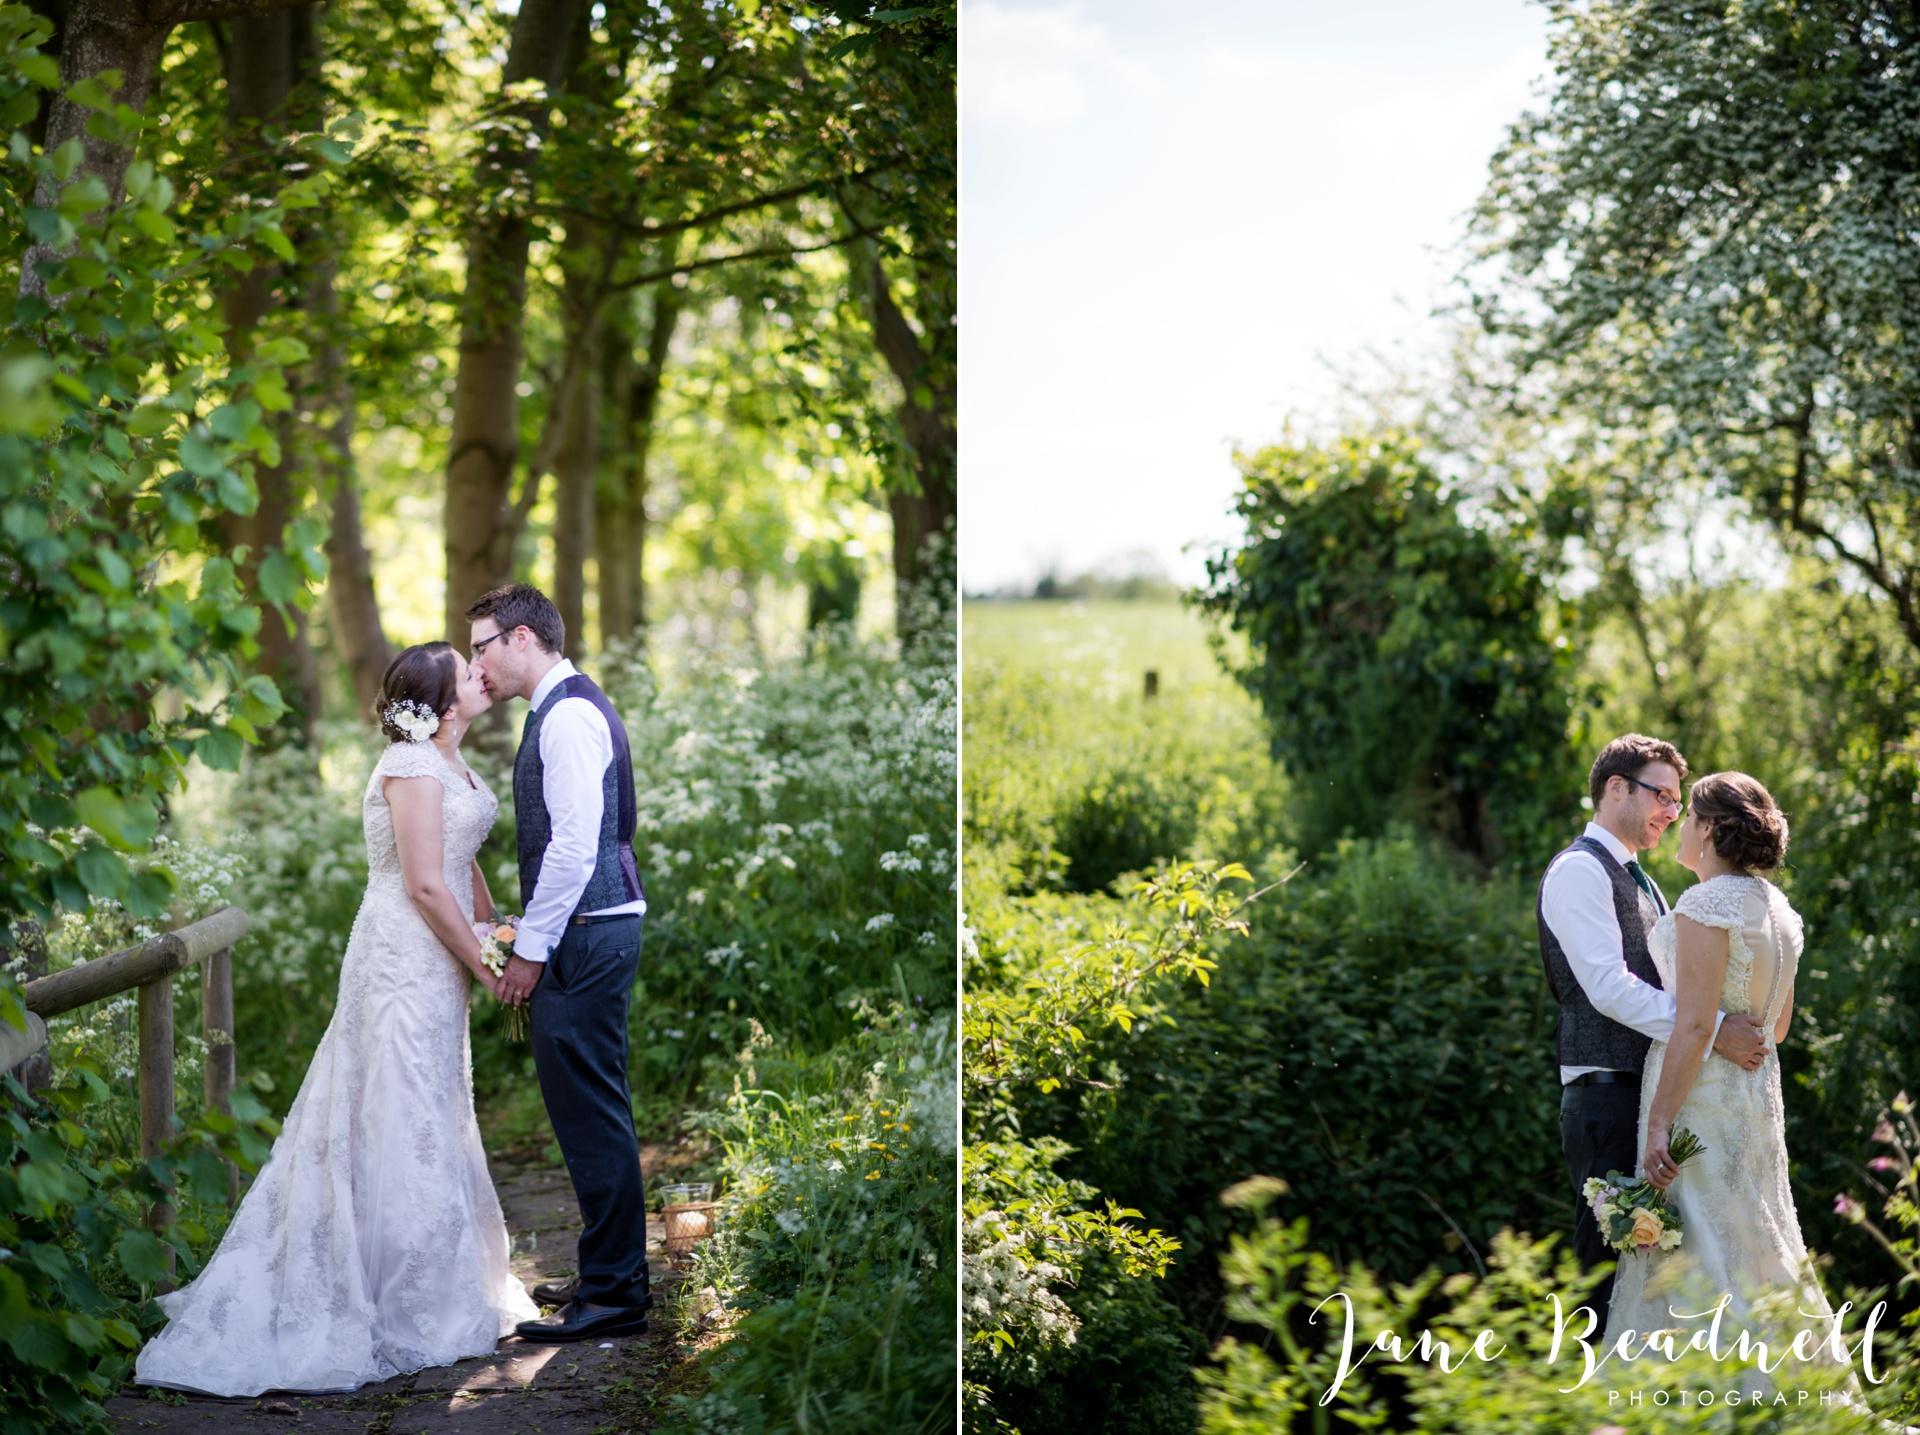 Bath Abbey wedding photography by fine art wedding photographer Leeds Jane Beadnell_43